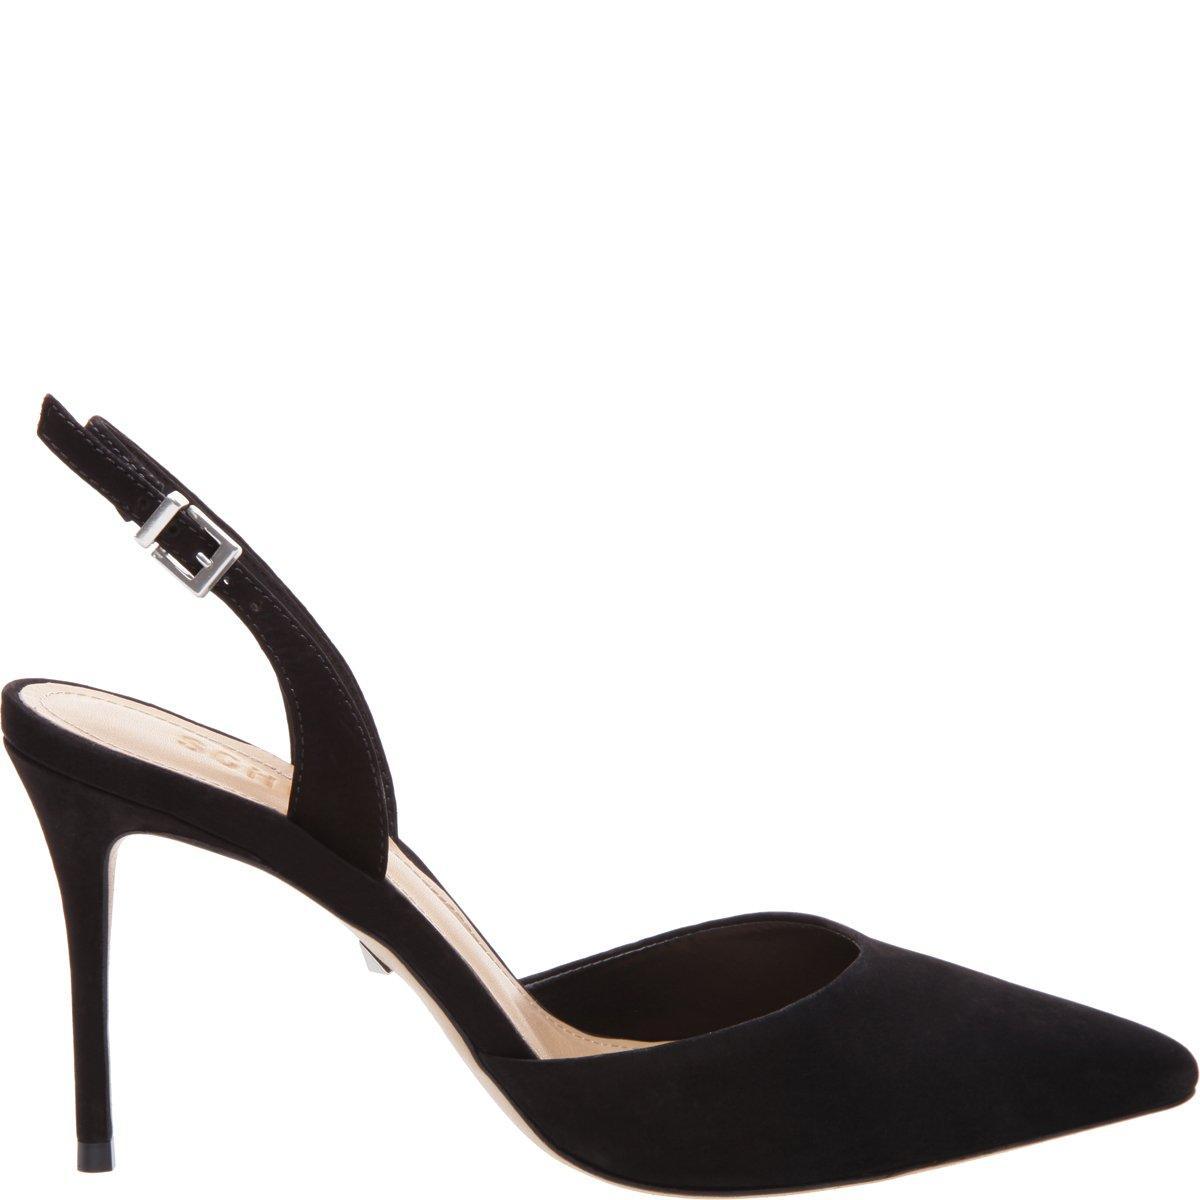 19f8997dba84c Women's Maysha Slingback Pointed-Toe Pumps in Black